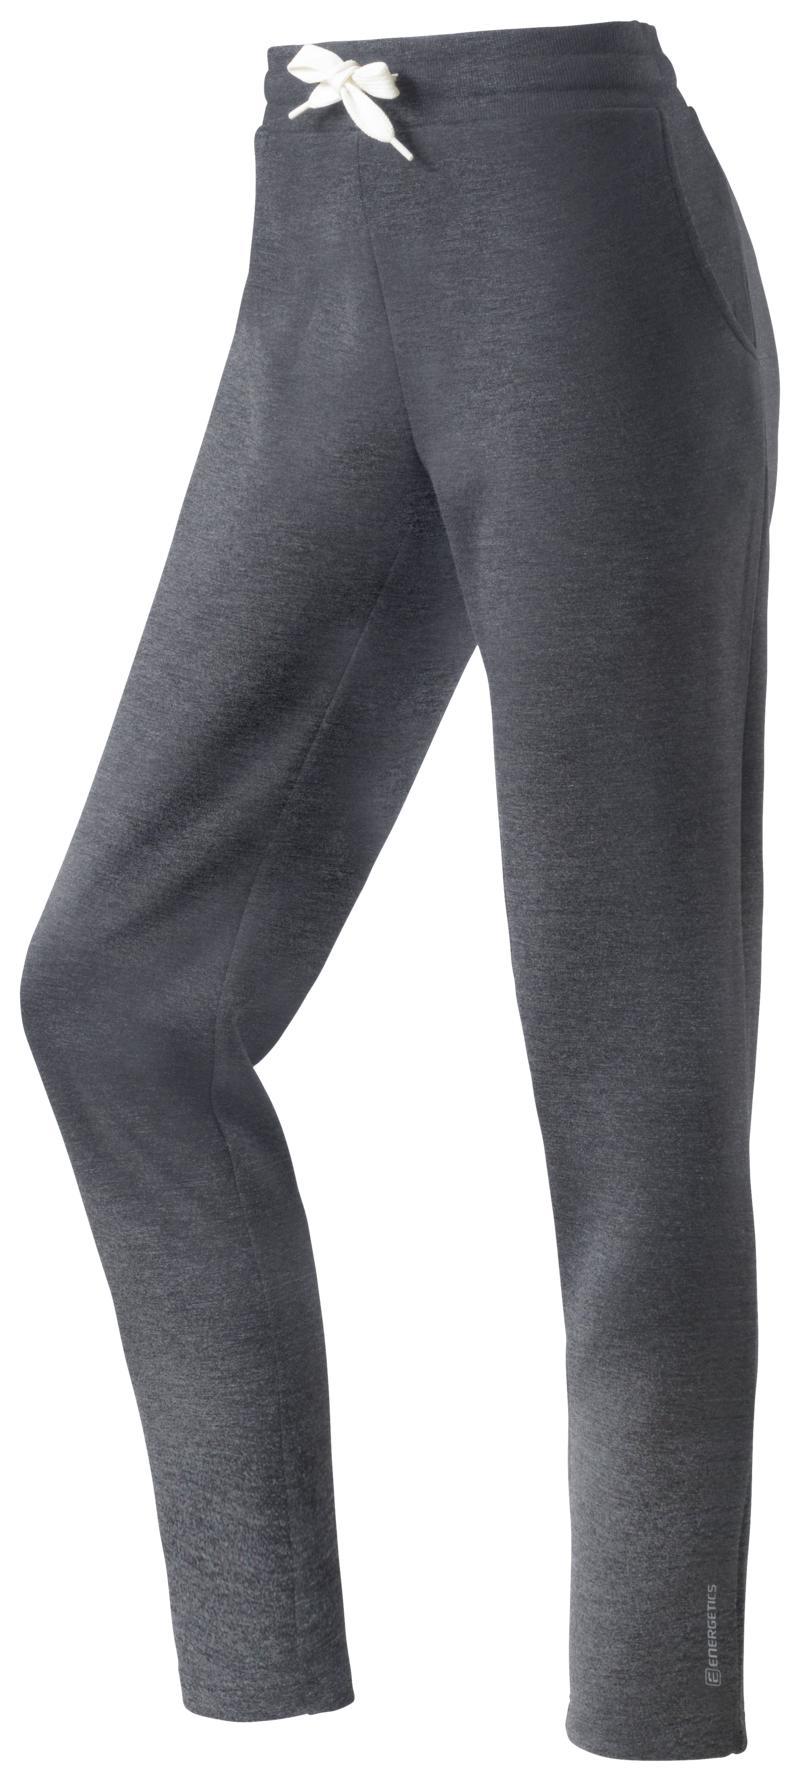 Energetics KIEL 3 WMS, ženske fitnes hlače, crna